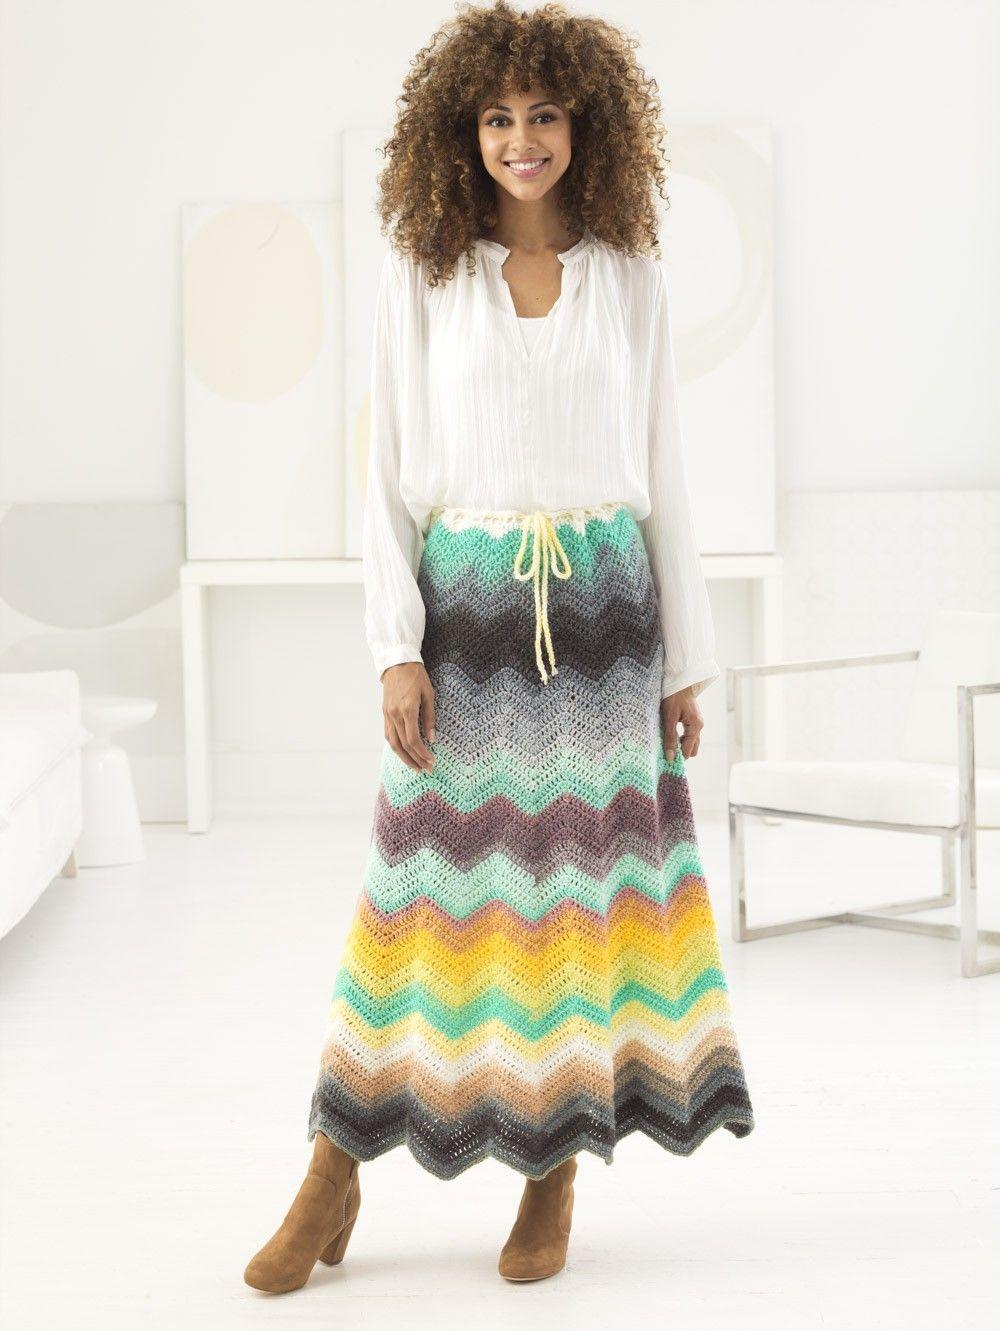 Amalfi Skirt (Crochet) *Out of Stock - ETA January 2018 | To make ...